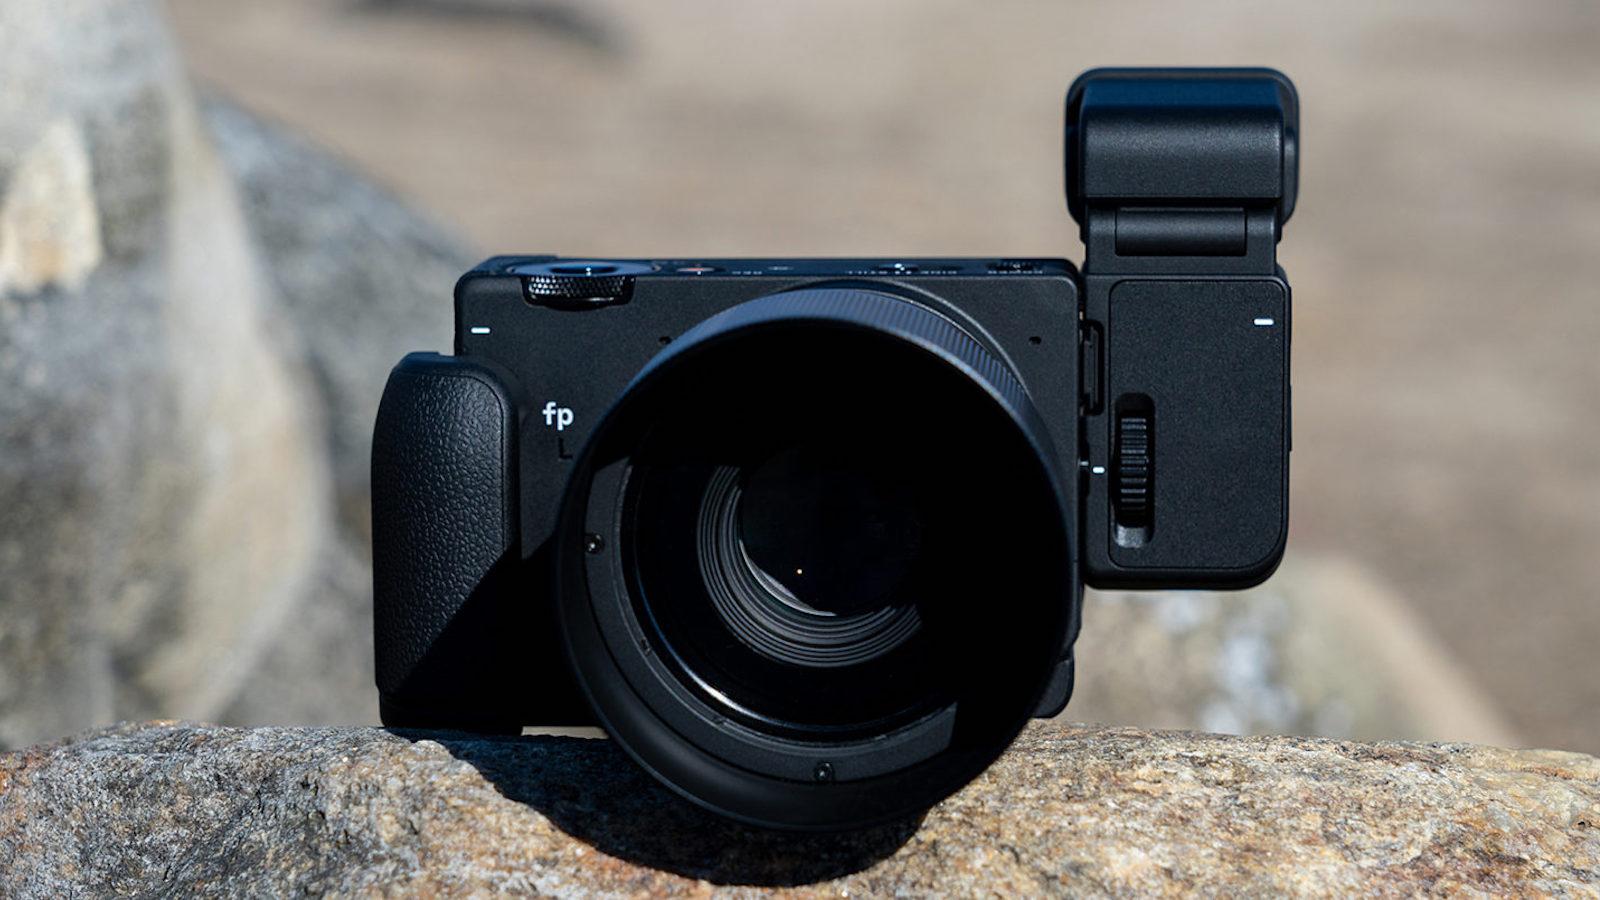 SIGMA fp L digital camera features a higher resolution 61 mp sensor than the fp camera